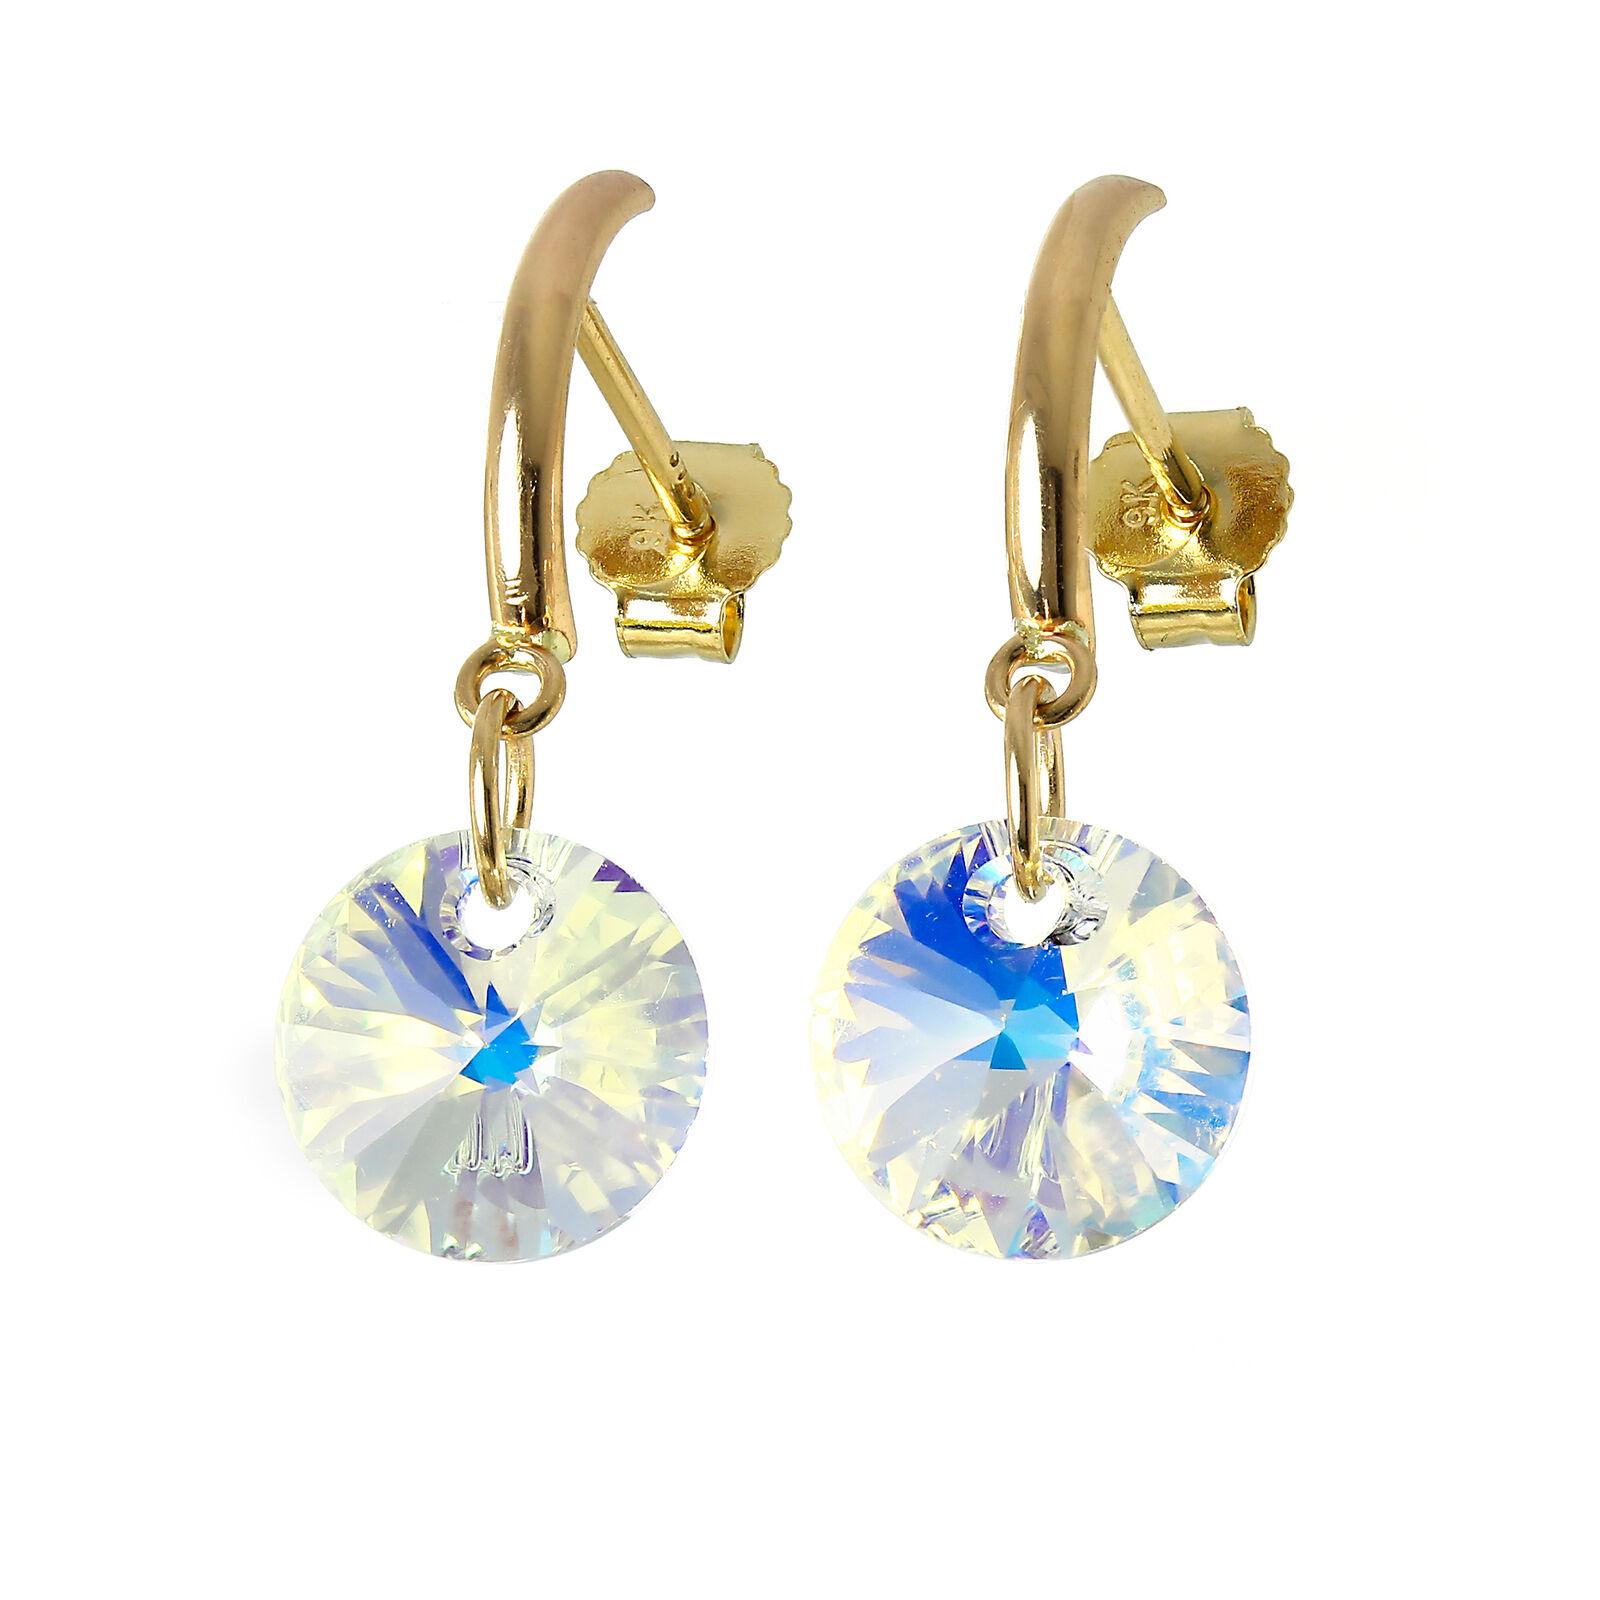 9ct gold & Round Aurora Borealis CZ Crystal Stud Earrings Studs Dangle